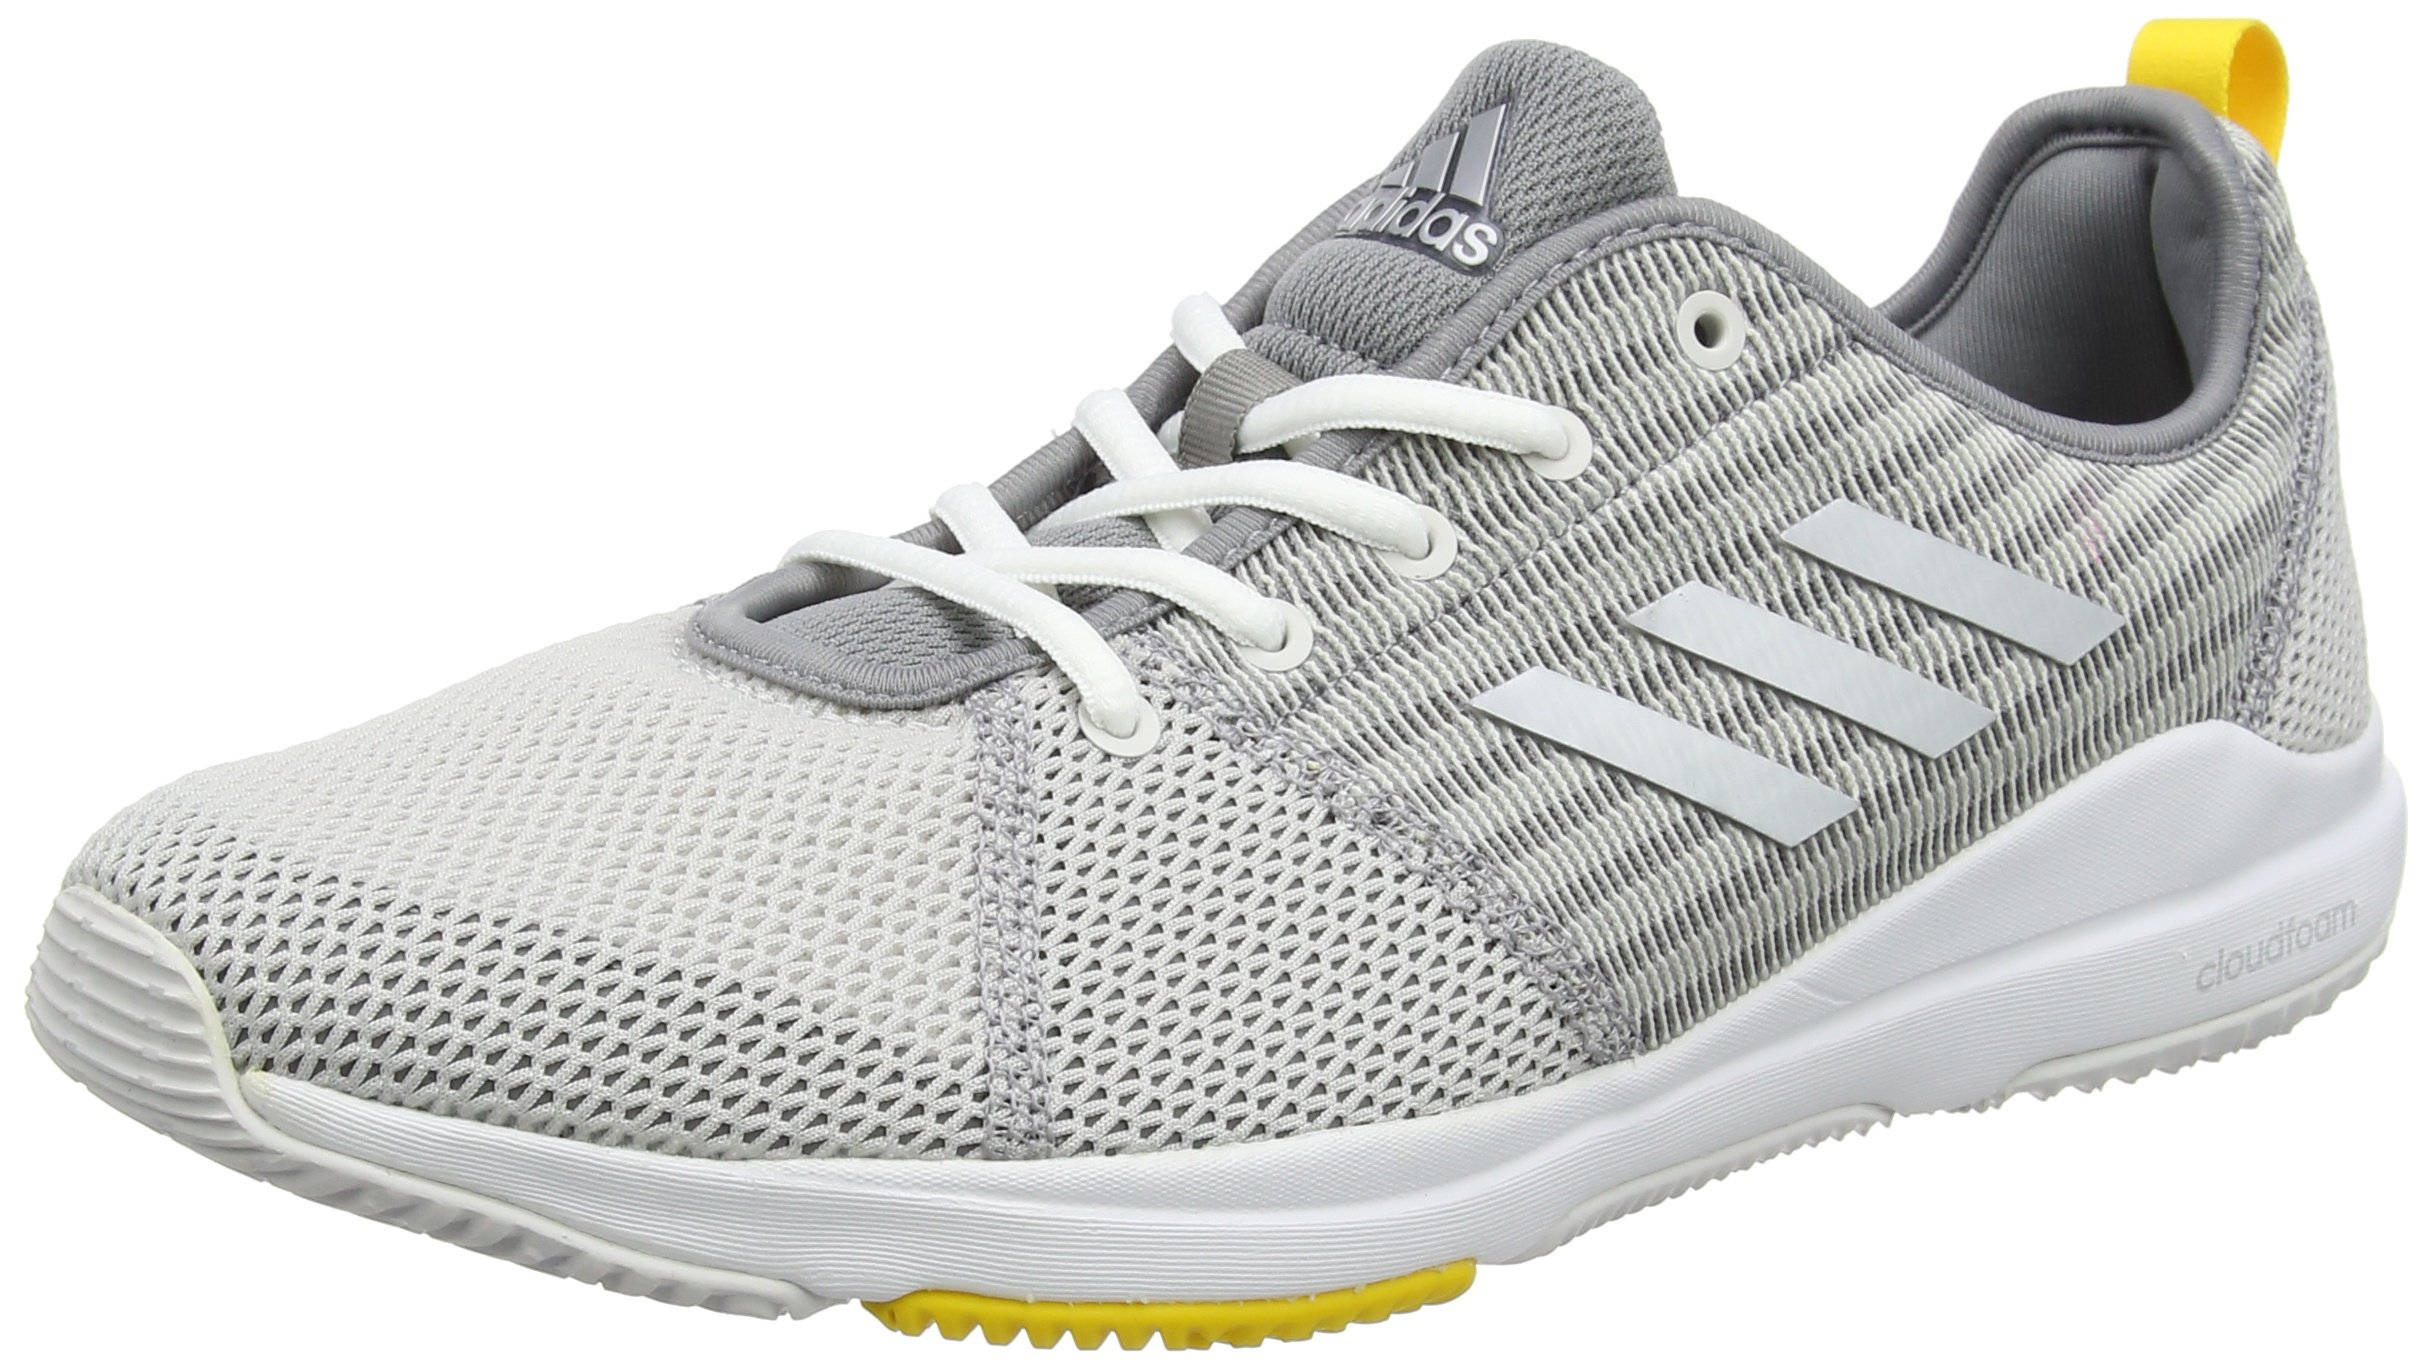 adidas Women's Arianna Cloudfoam Running Shoes- Buy Online in ...